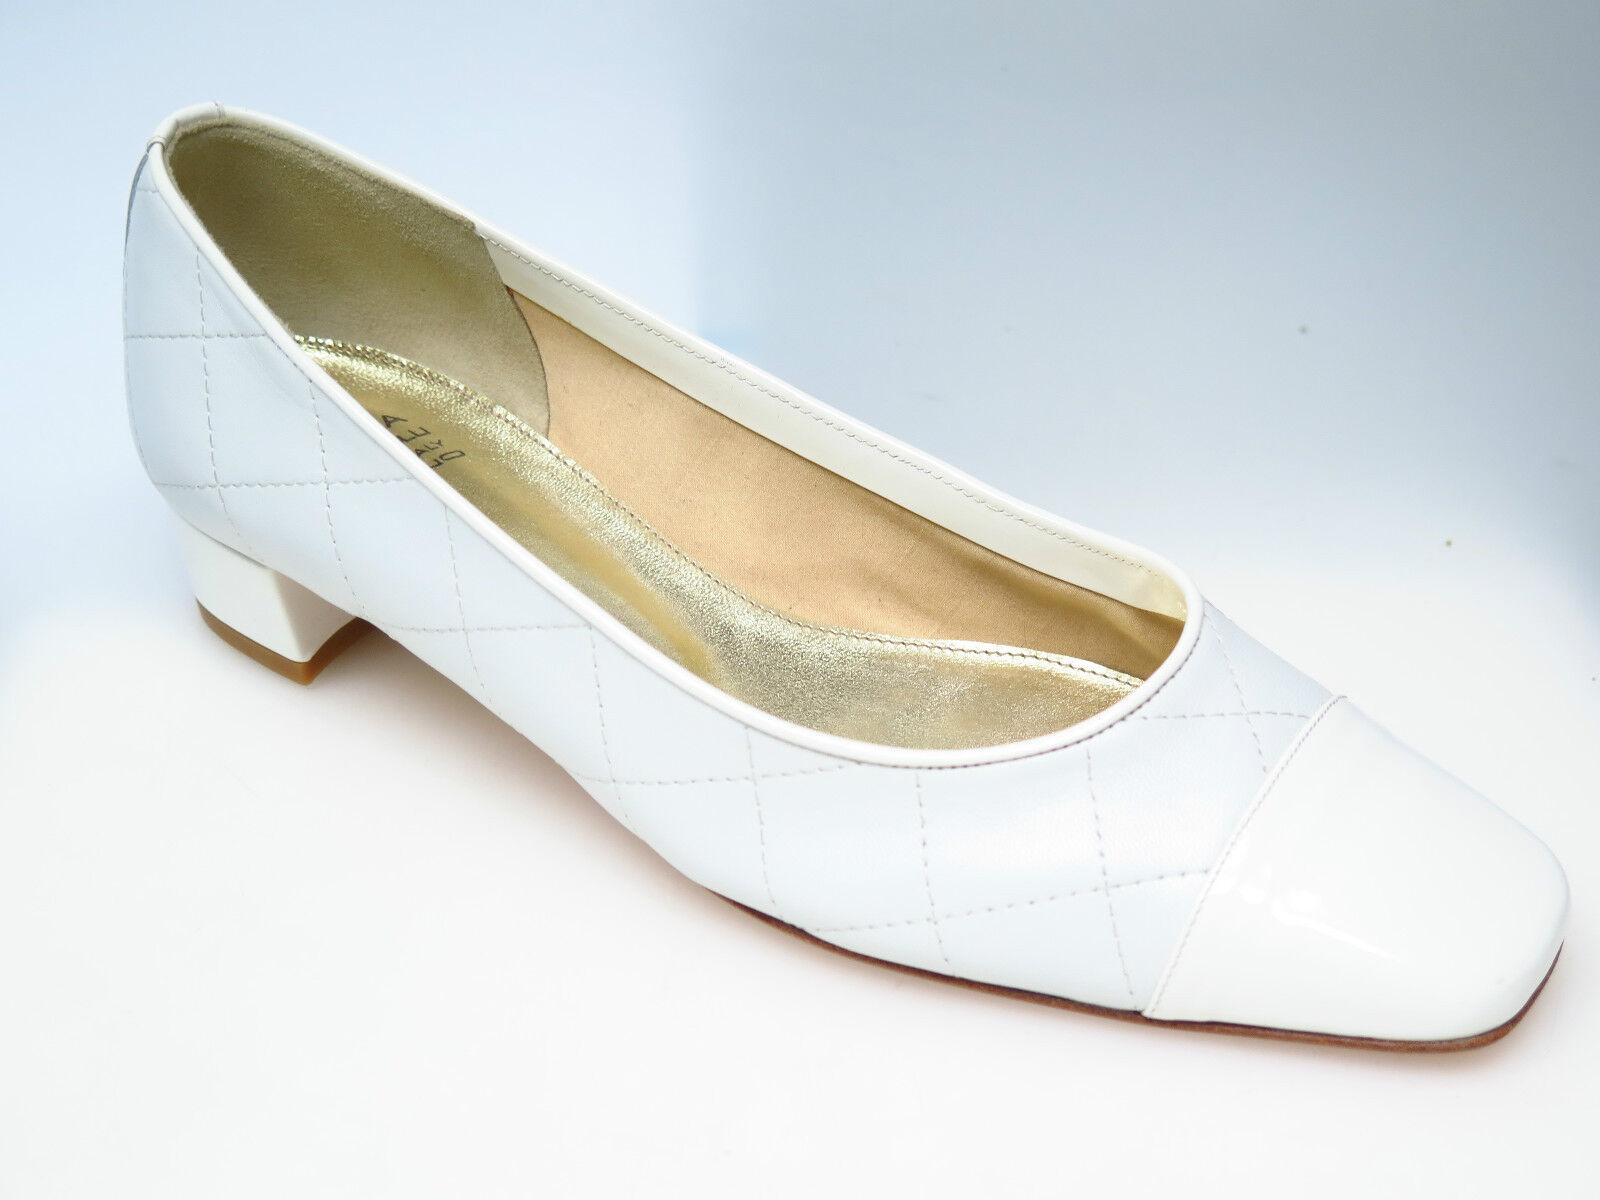 SULTANA Schuhe Designer Damenschuhe N2714 N2714 N2714 Lucy Nappa Bianco Coco Gr. 37,5 NEU 51bde8